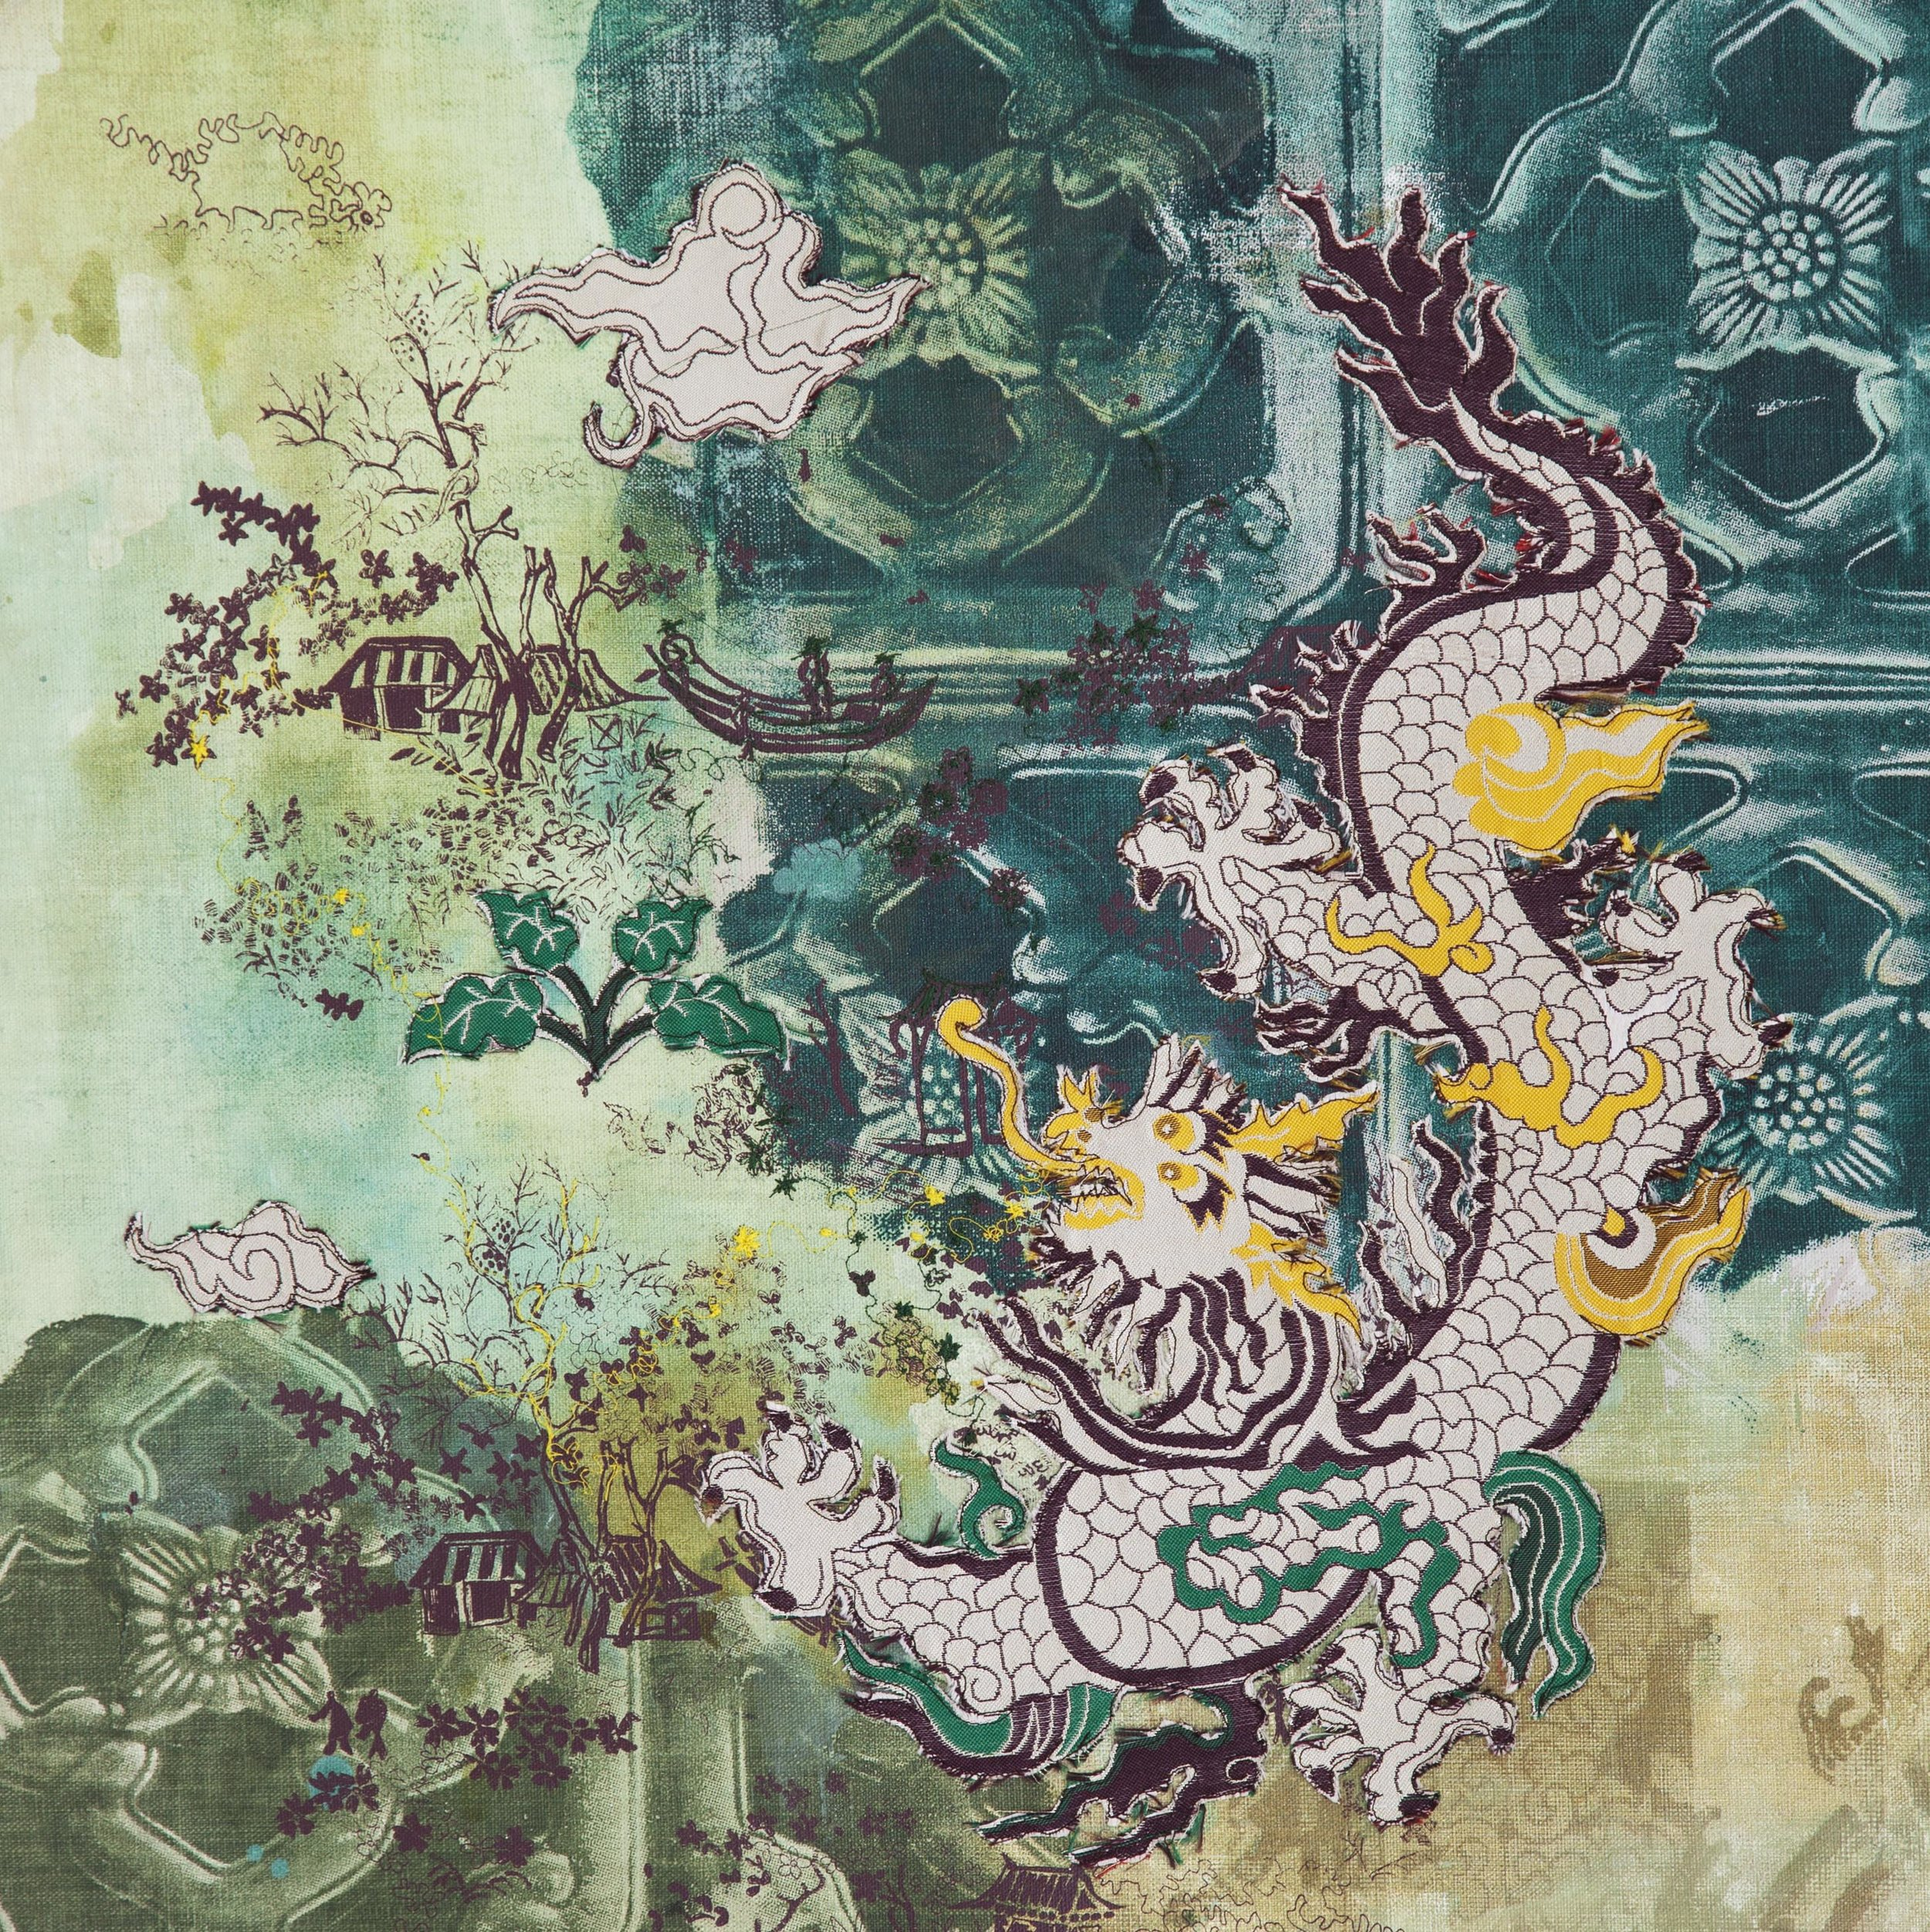 Title: Jade Dragon